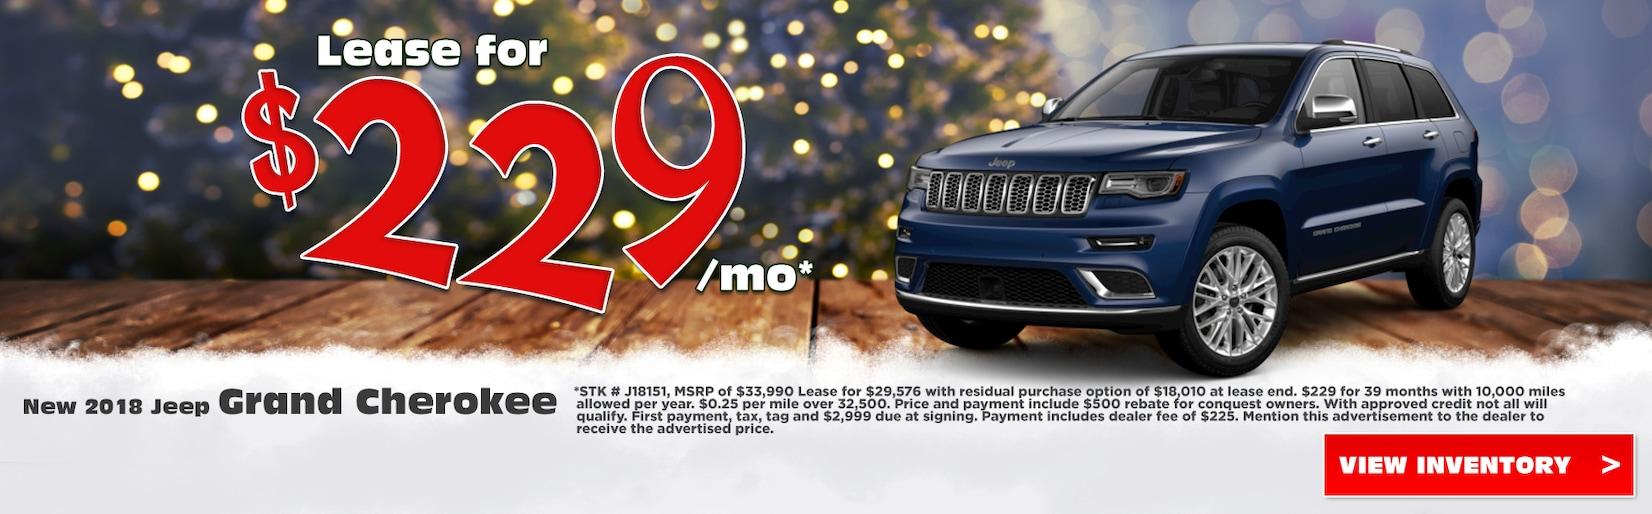 Used Car Dealerships Greenville Sc >> New Chrysler Dodge Jeep RAM and used car dealer offering ...